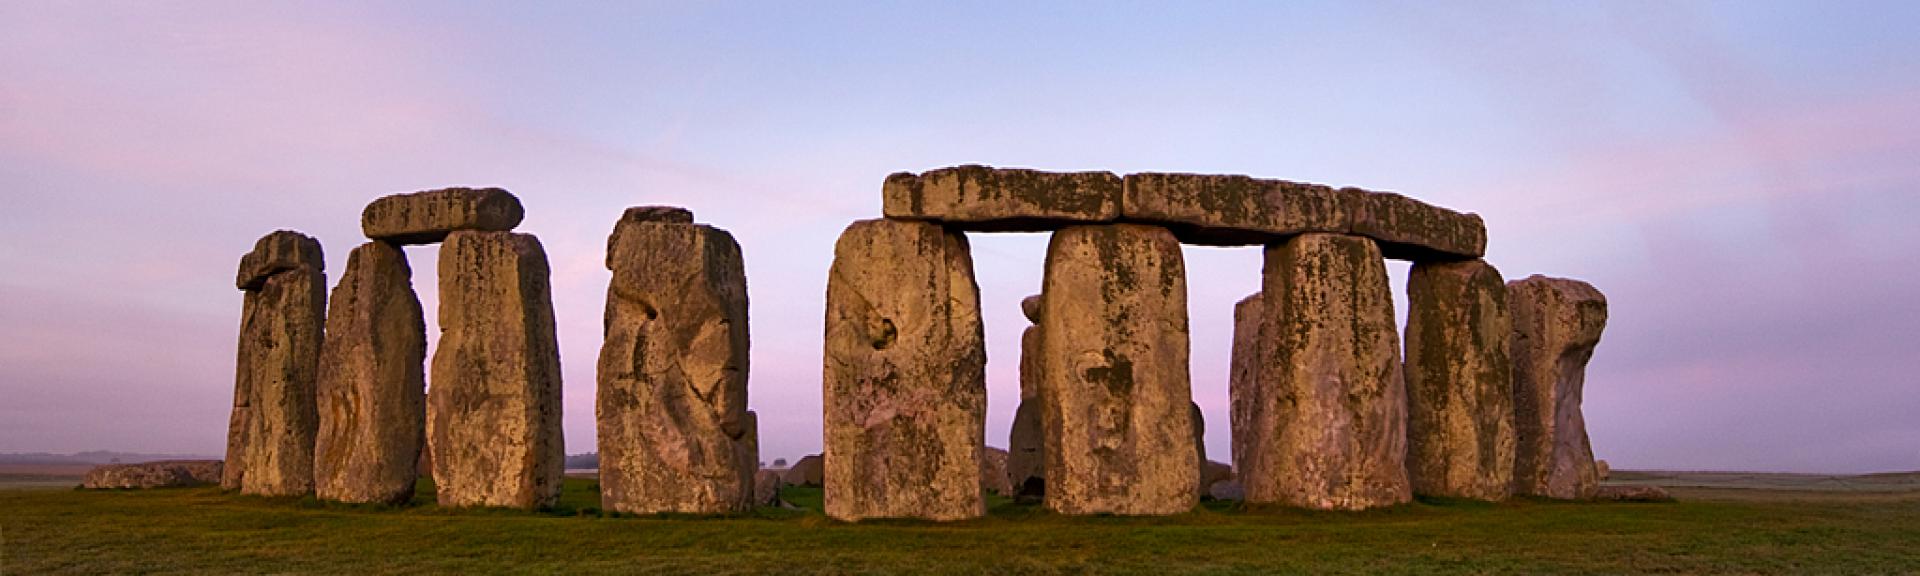 Stonehenge, England | Information | Visit Britain